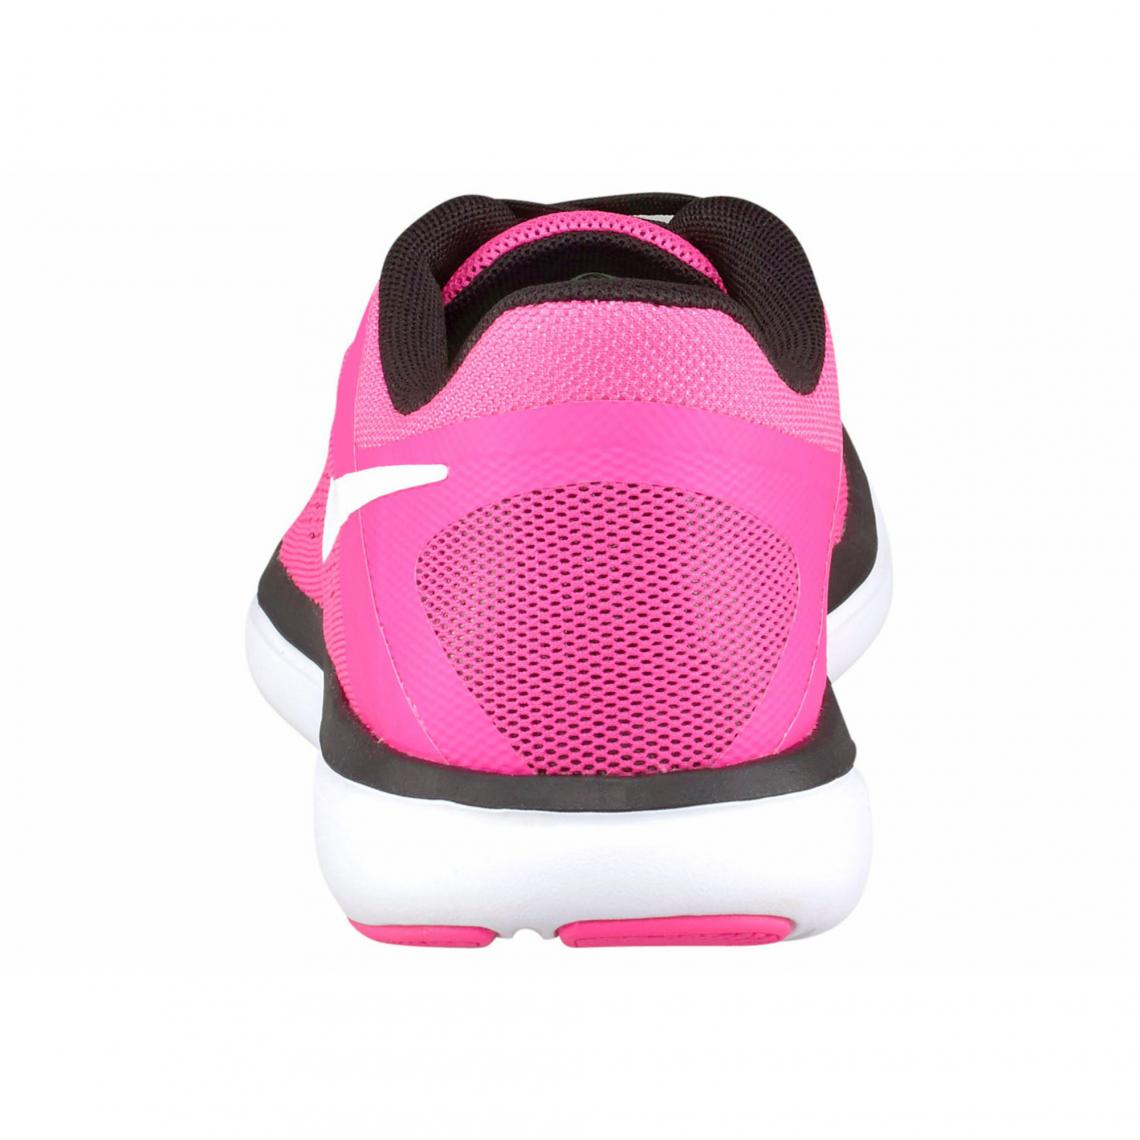 Nike Flex 2016 RN chaussures de running femme Rose | 3 SUISSES